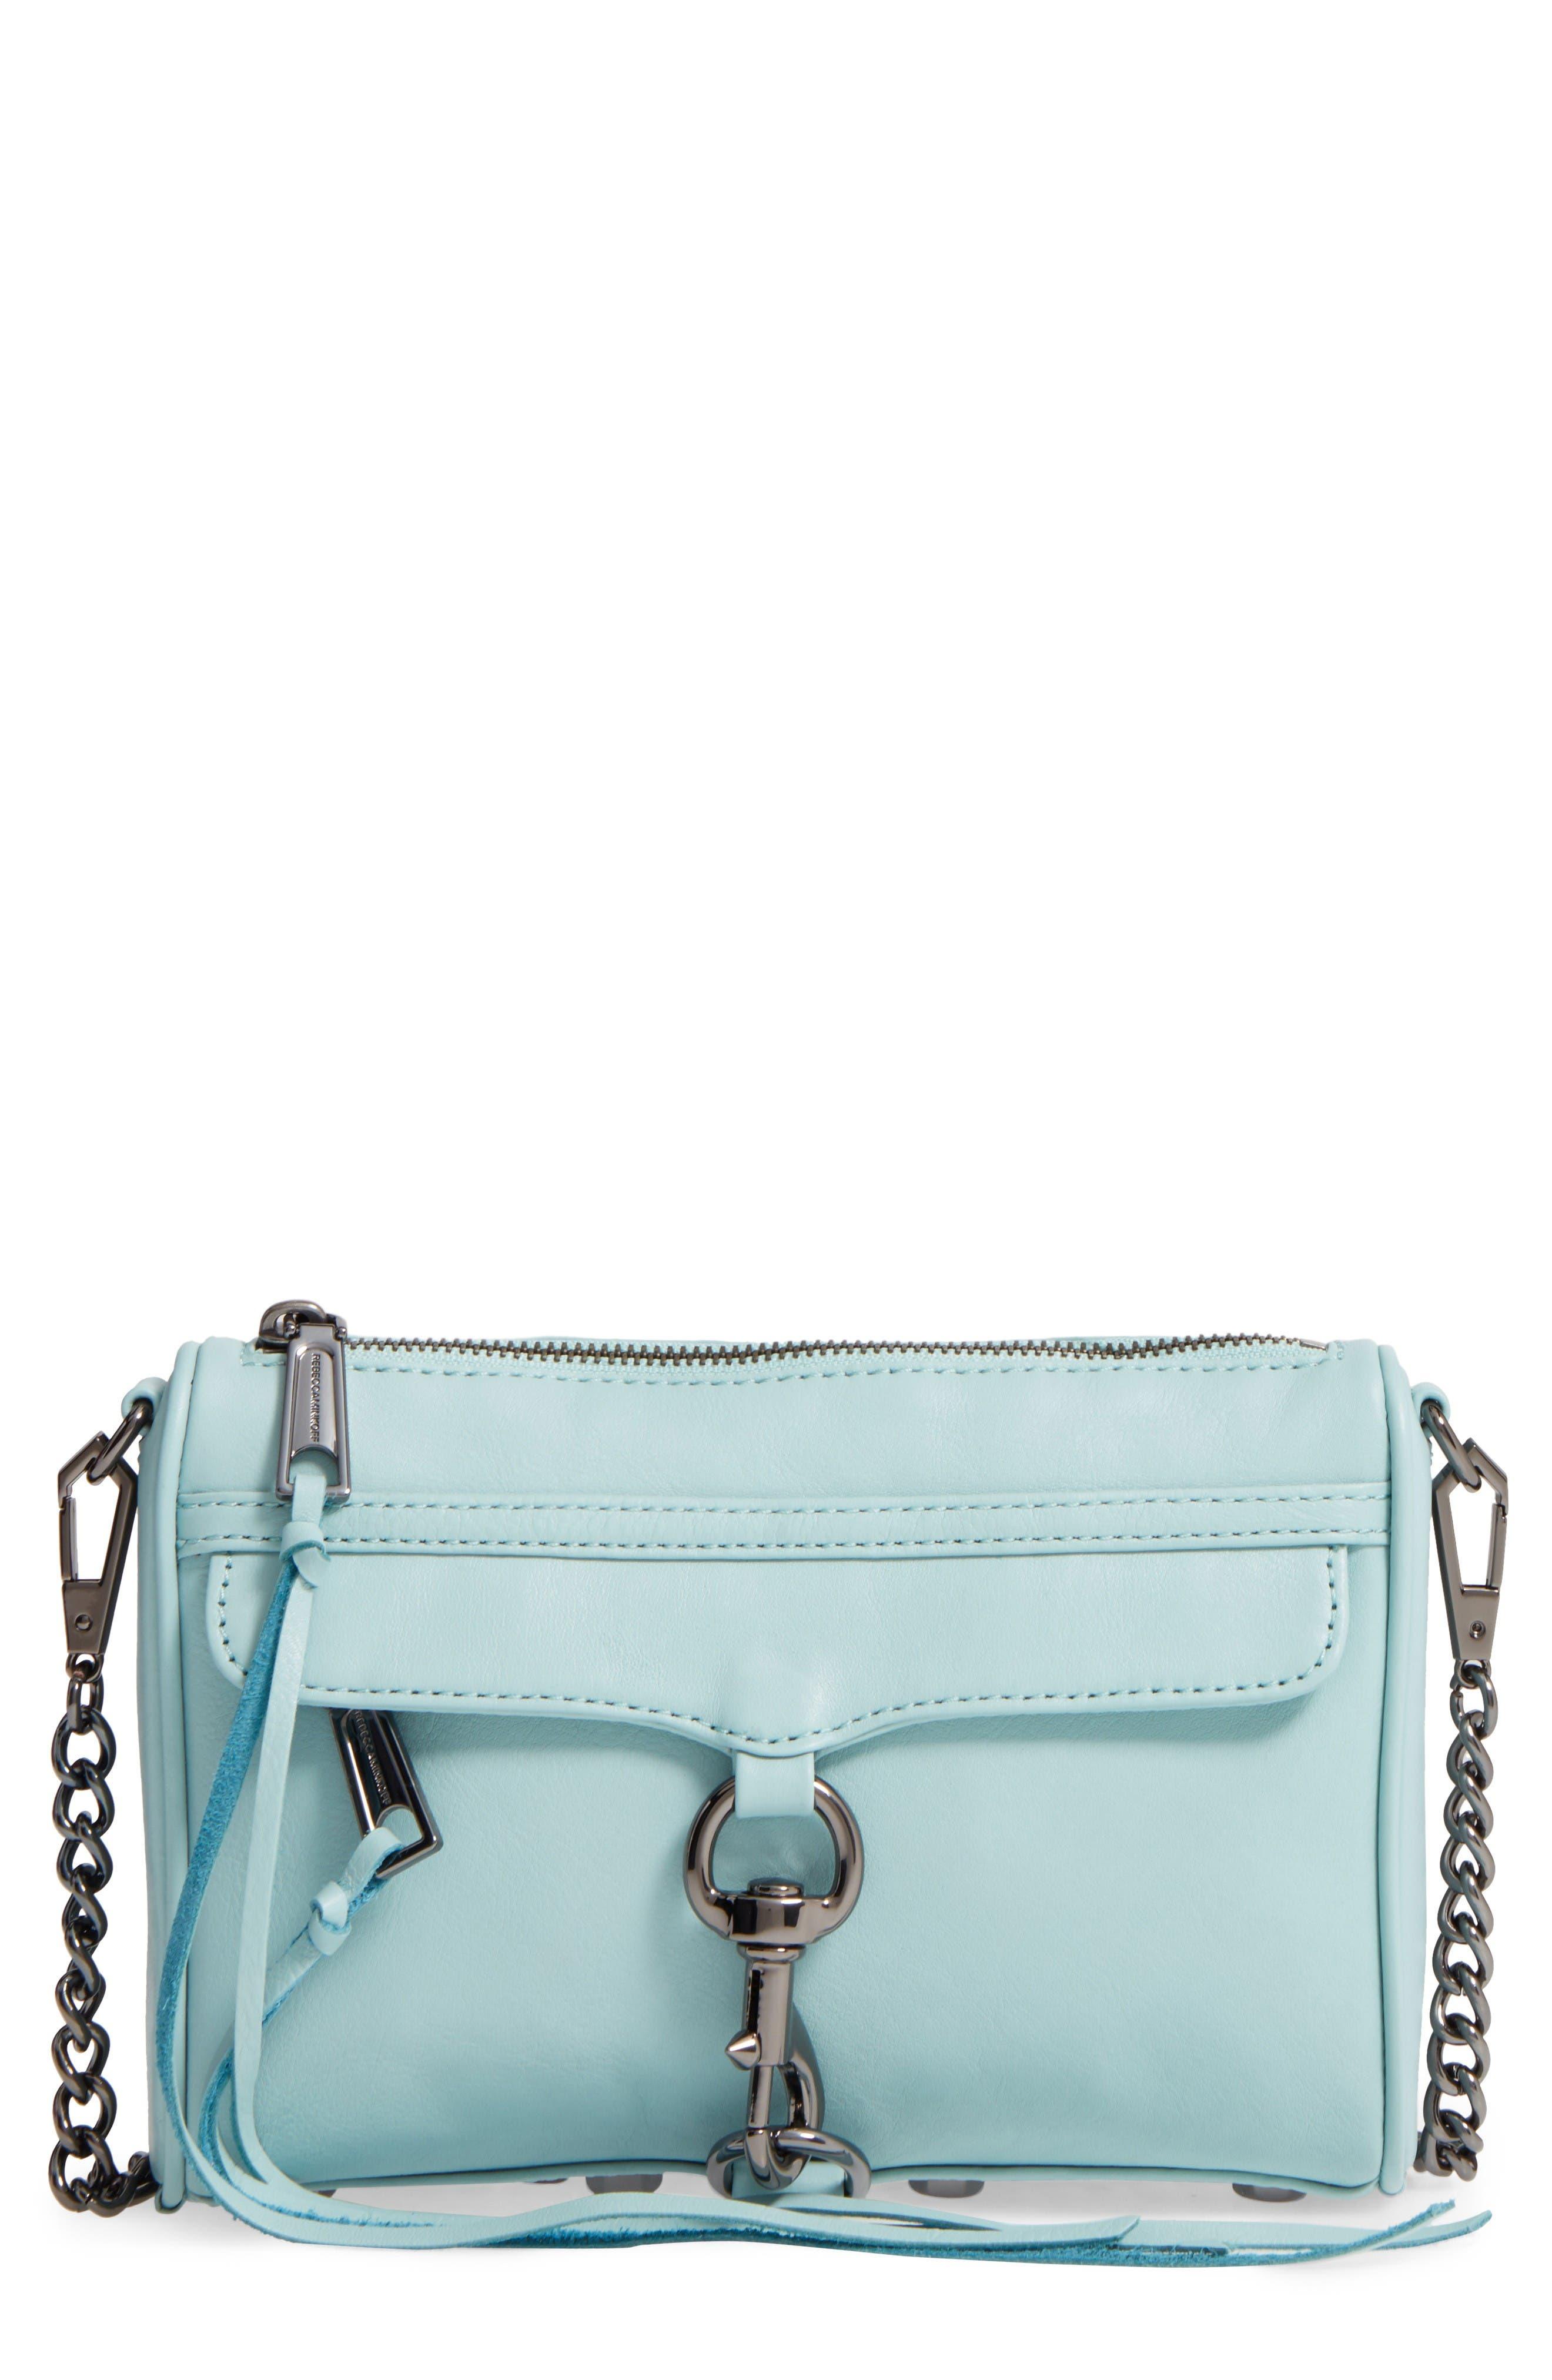 Rebecca Minkoff 'Mini MAC' Convertible Crossbody Bag